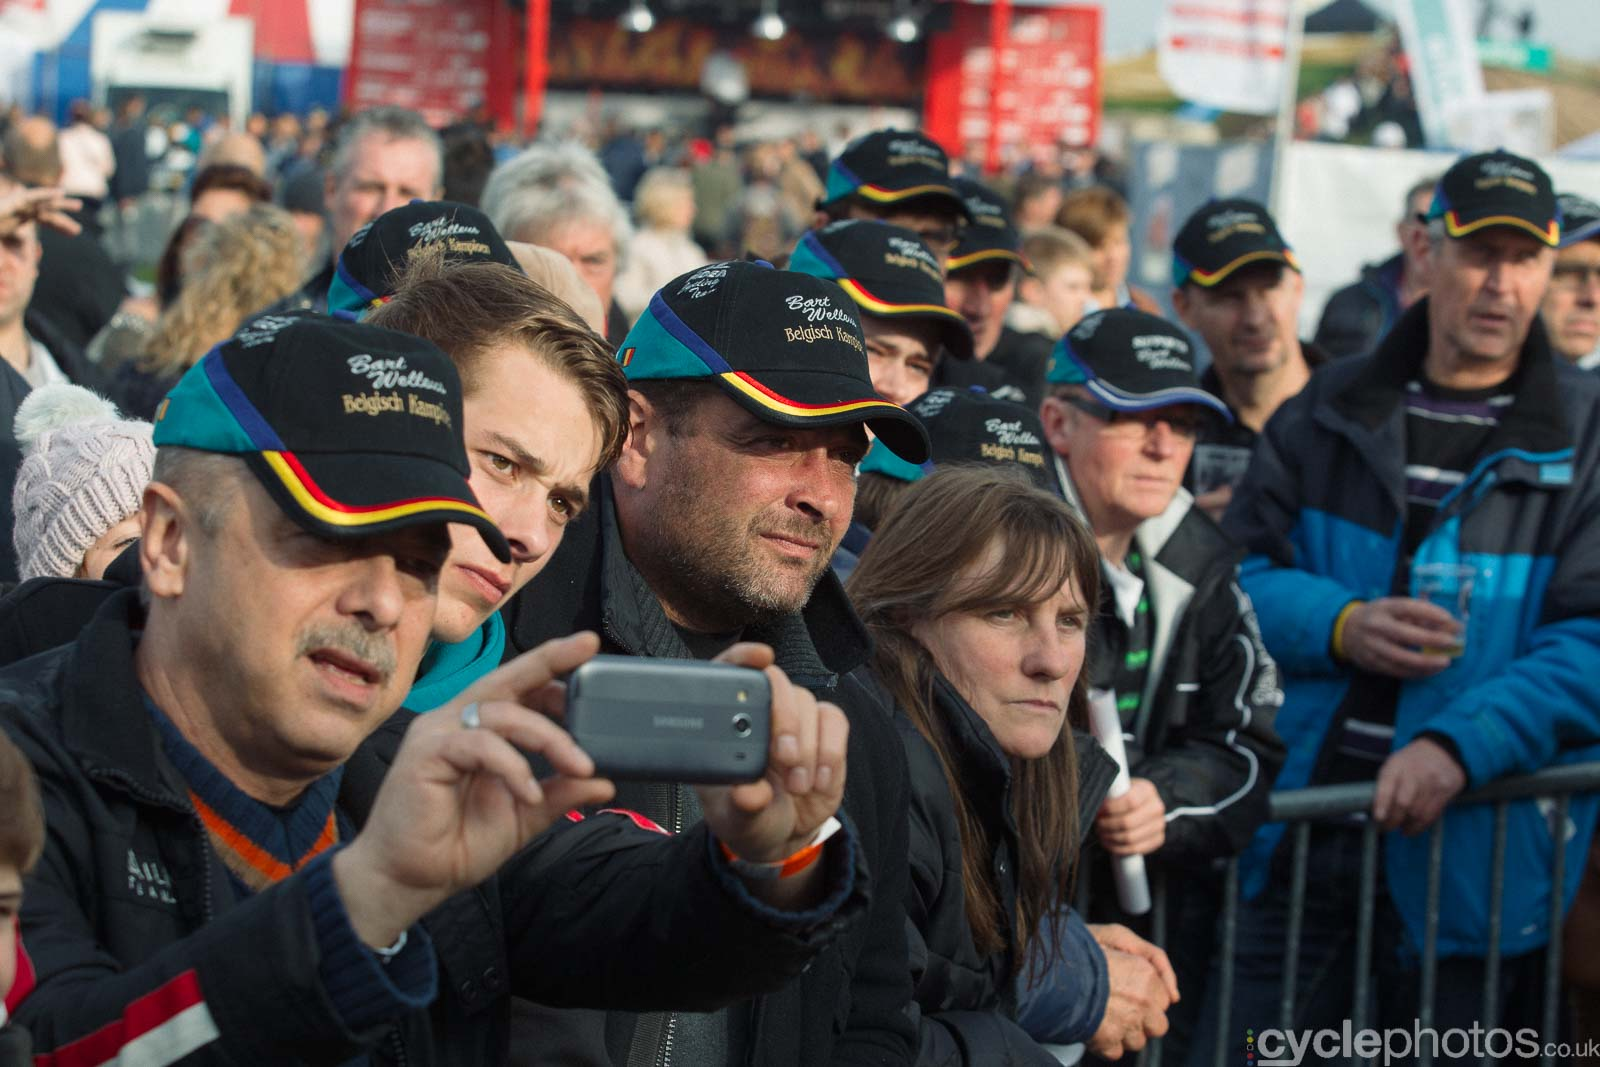 2015-cyclephotos-cyclocross-ruddervoorde-134616-bart-wellens-fans